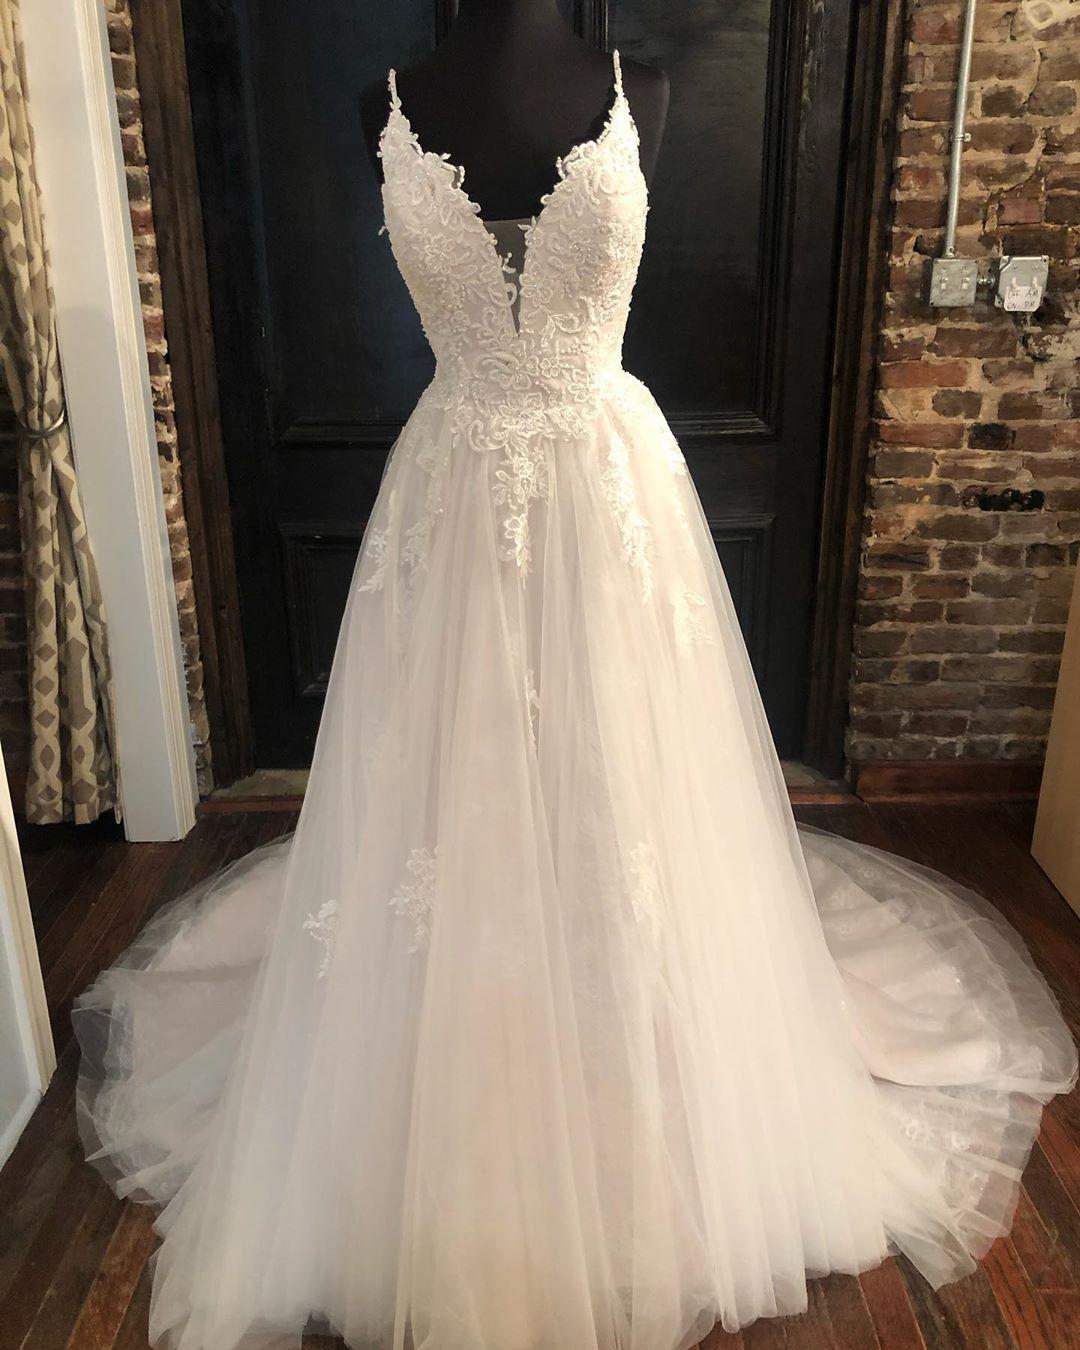 w95 ball gown lace wedding dresses,wedding dress,custom made wedding gown  from fancygirldress